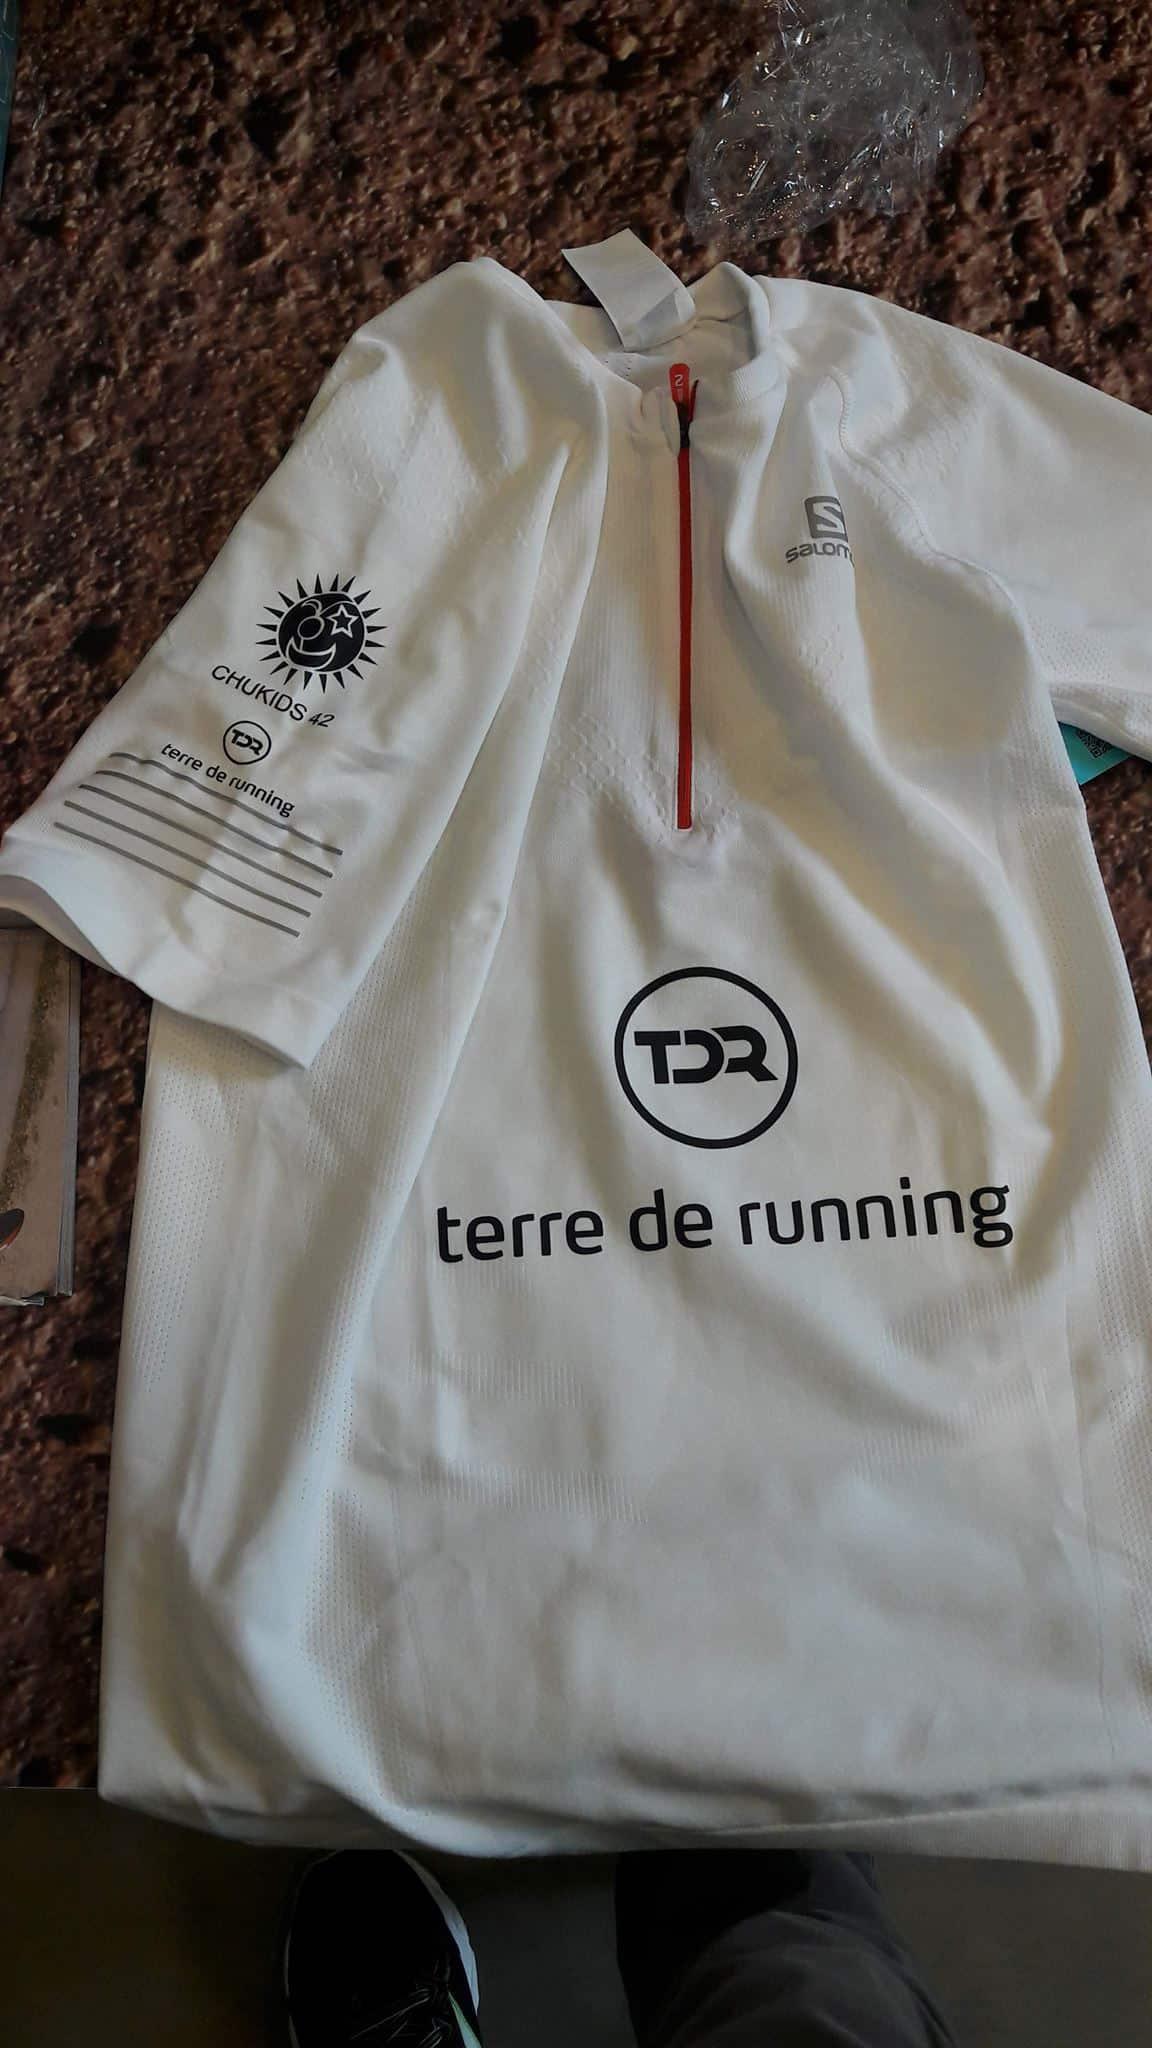 team TDr St Etienne